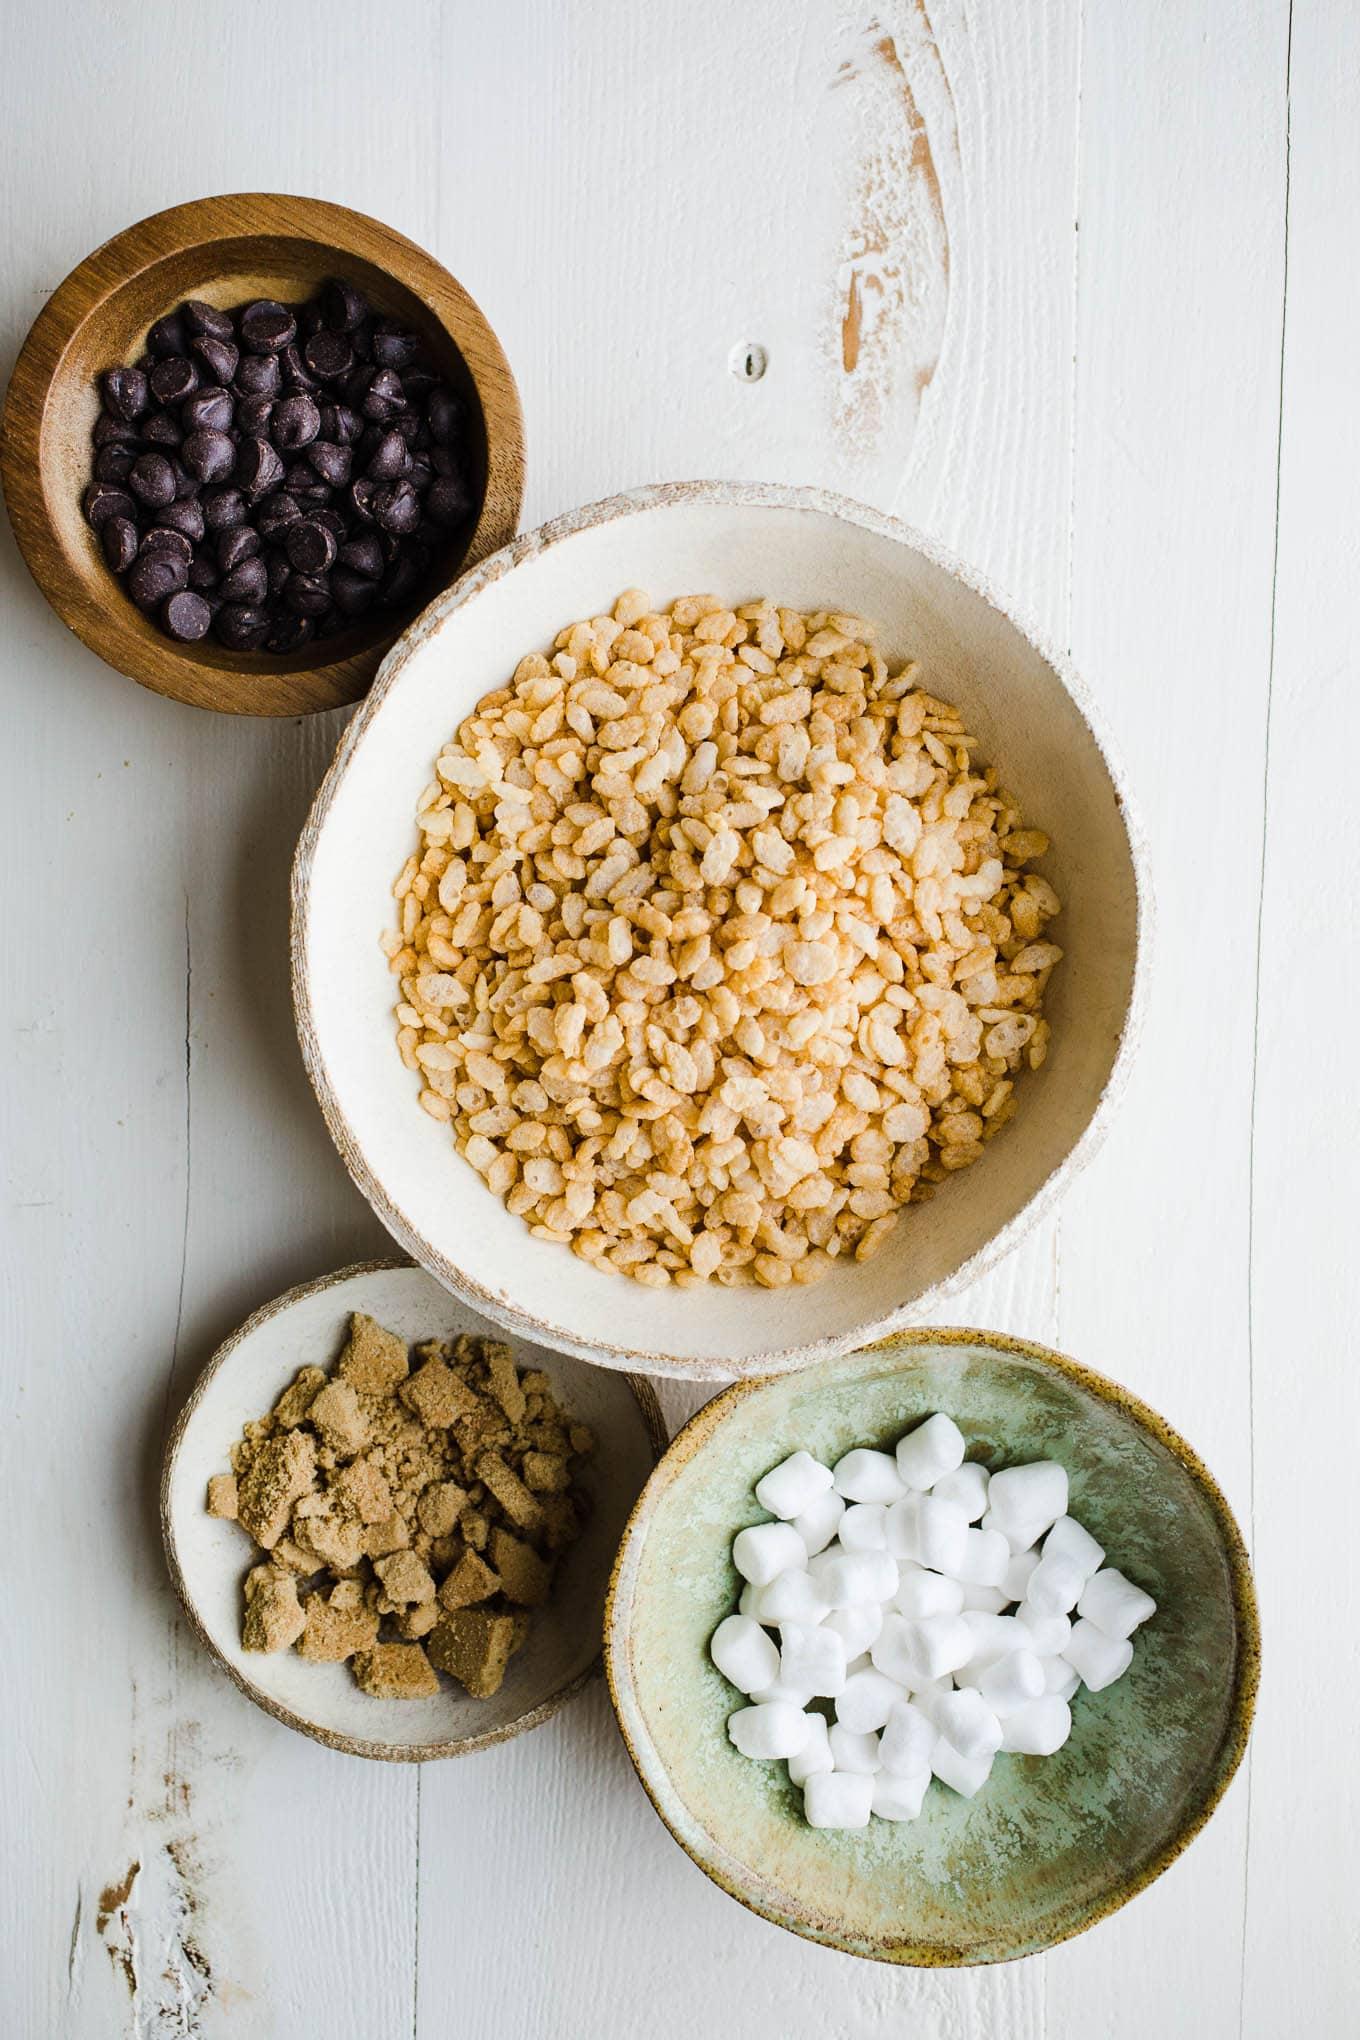 S'mores Rice Krispies Treats ingredients in bowls